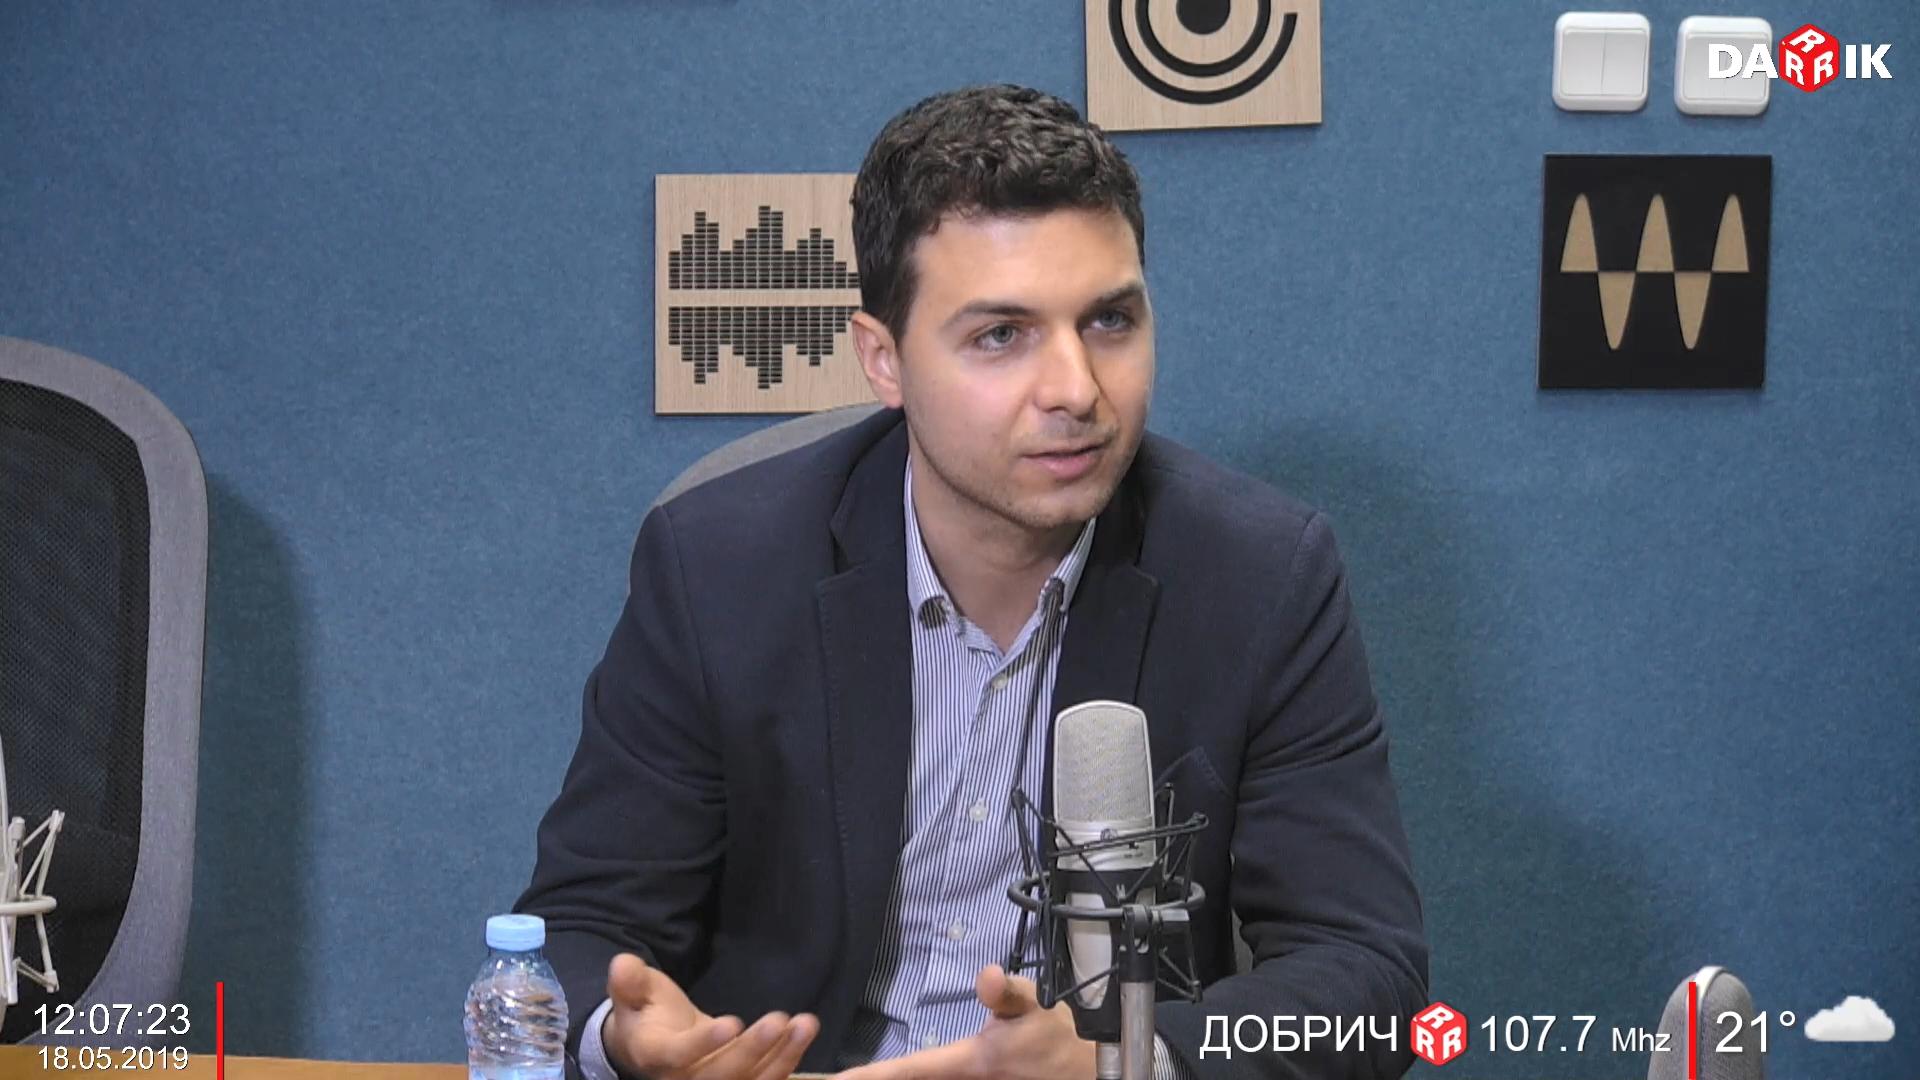 Никола Апостолов в Дарик Радио